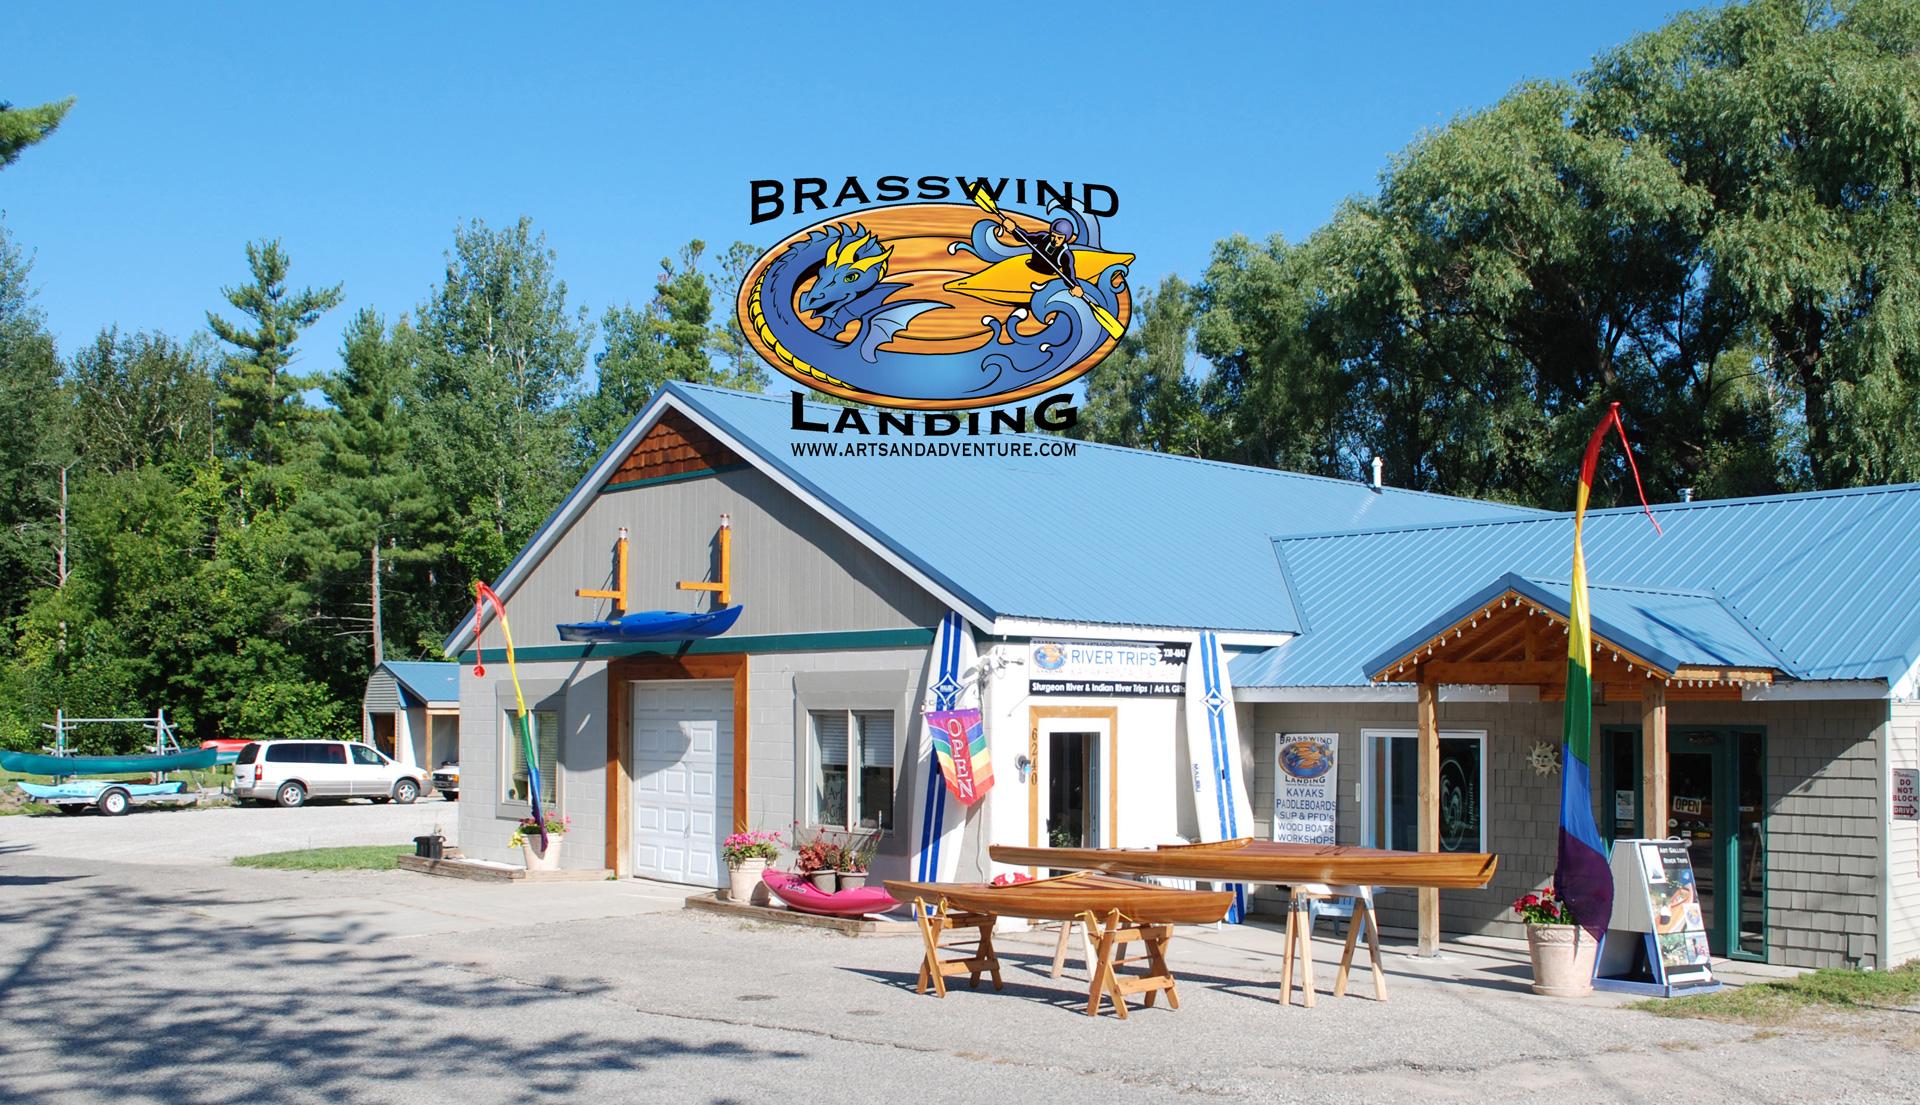 brasswind landing - image